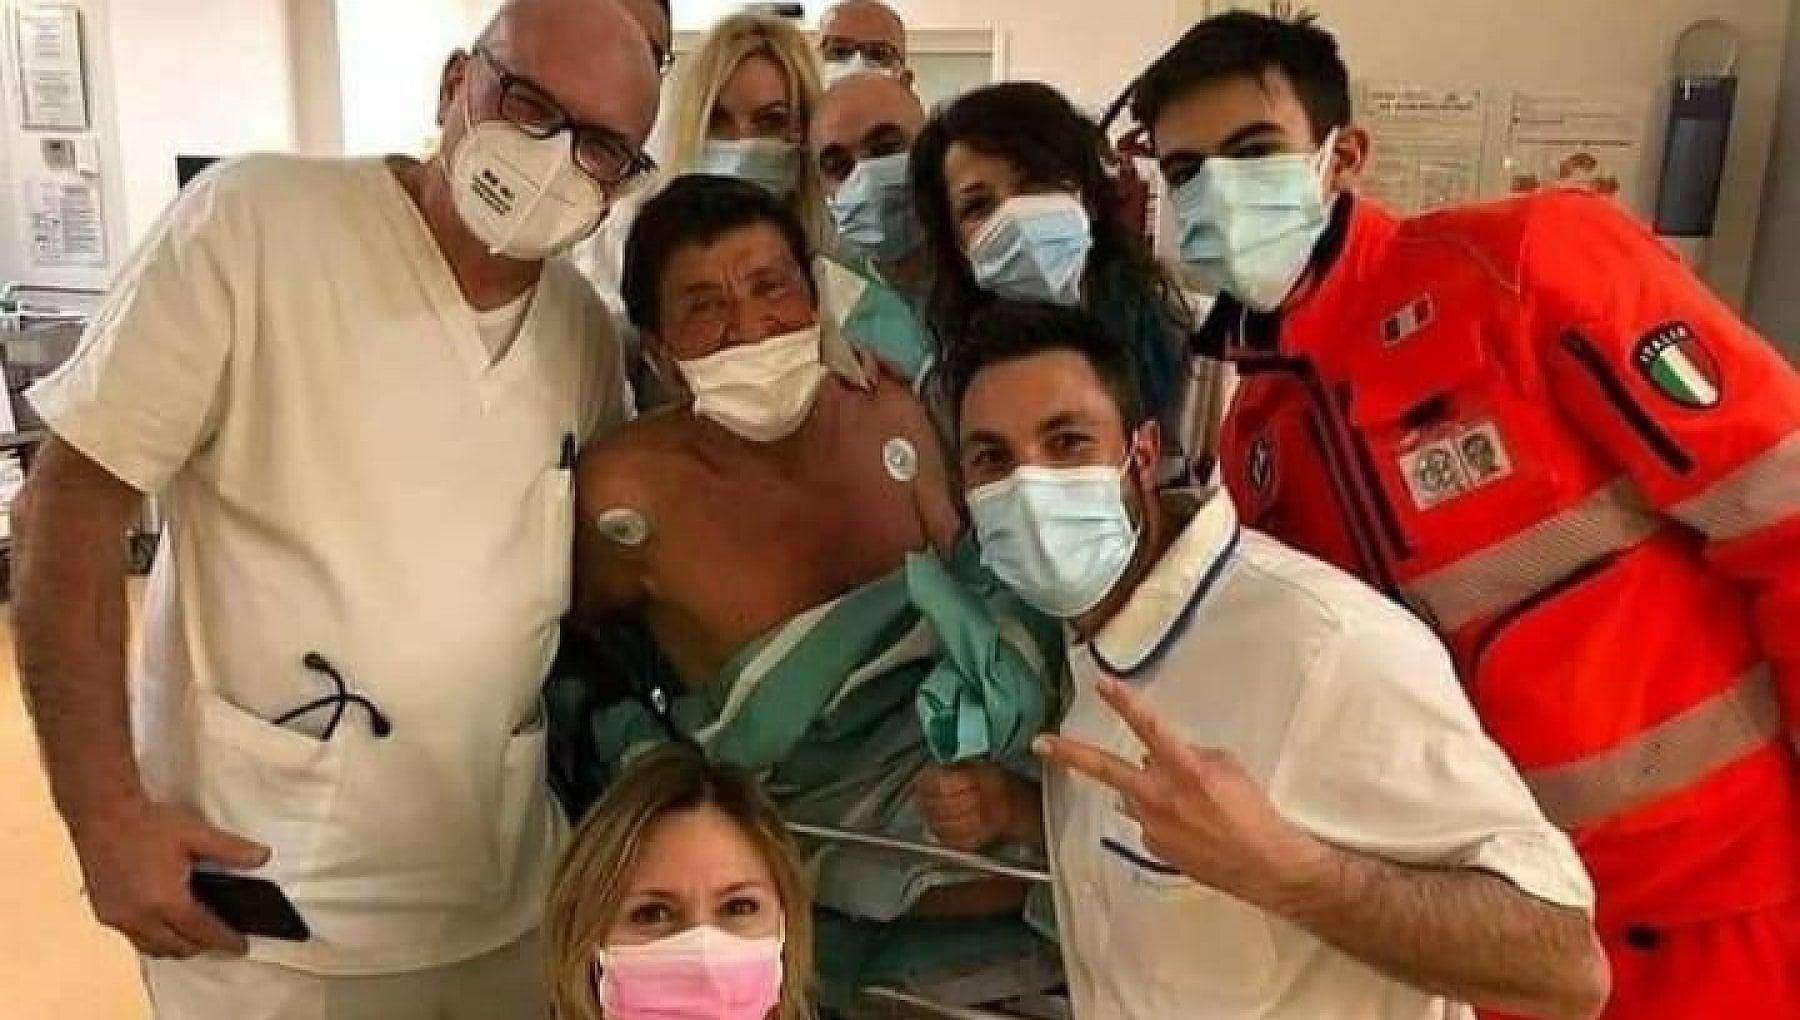 gianni-morandi-selfie-medici